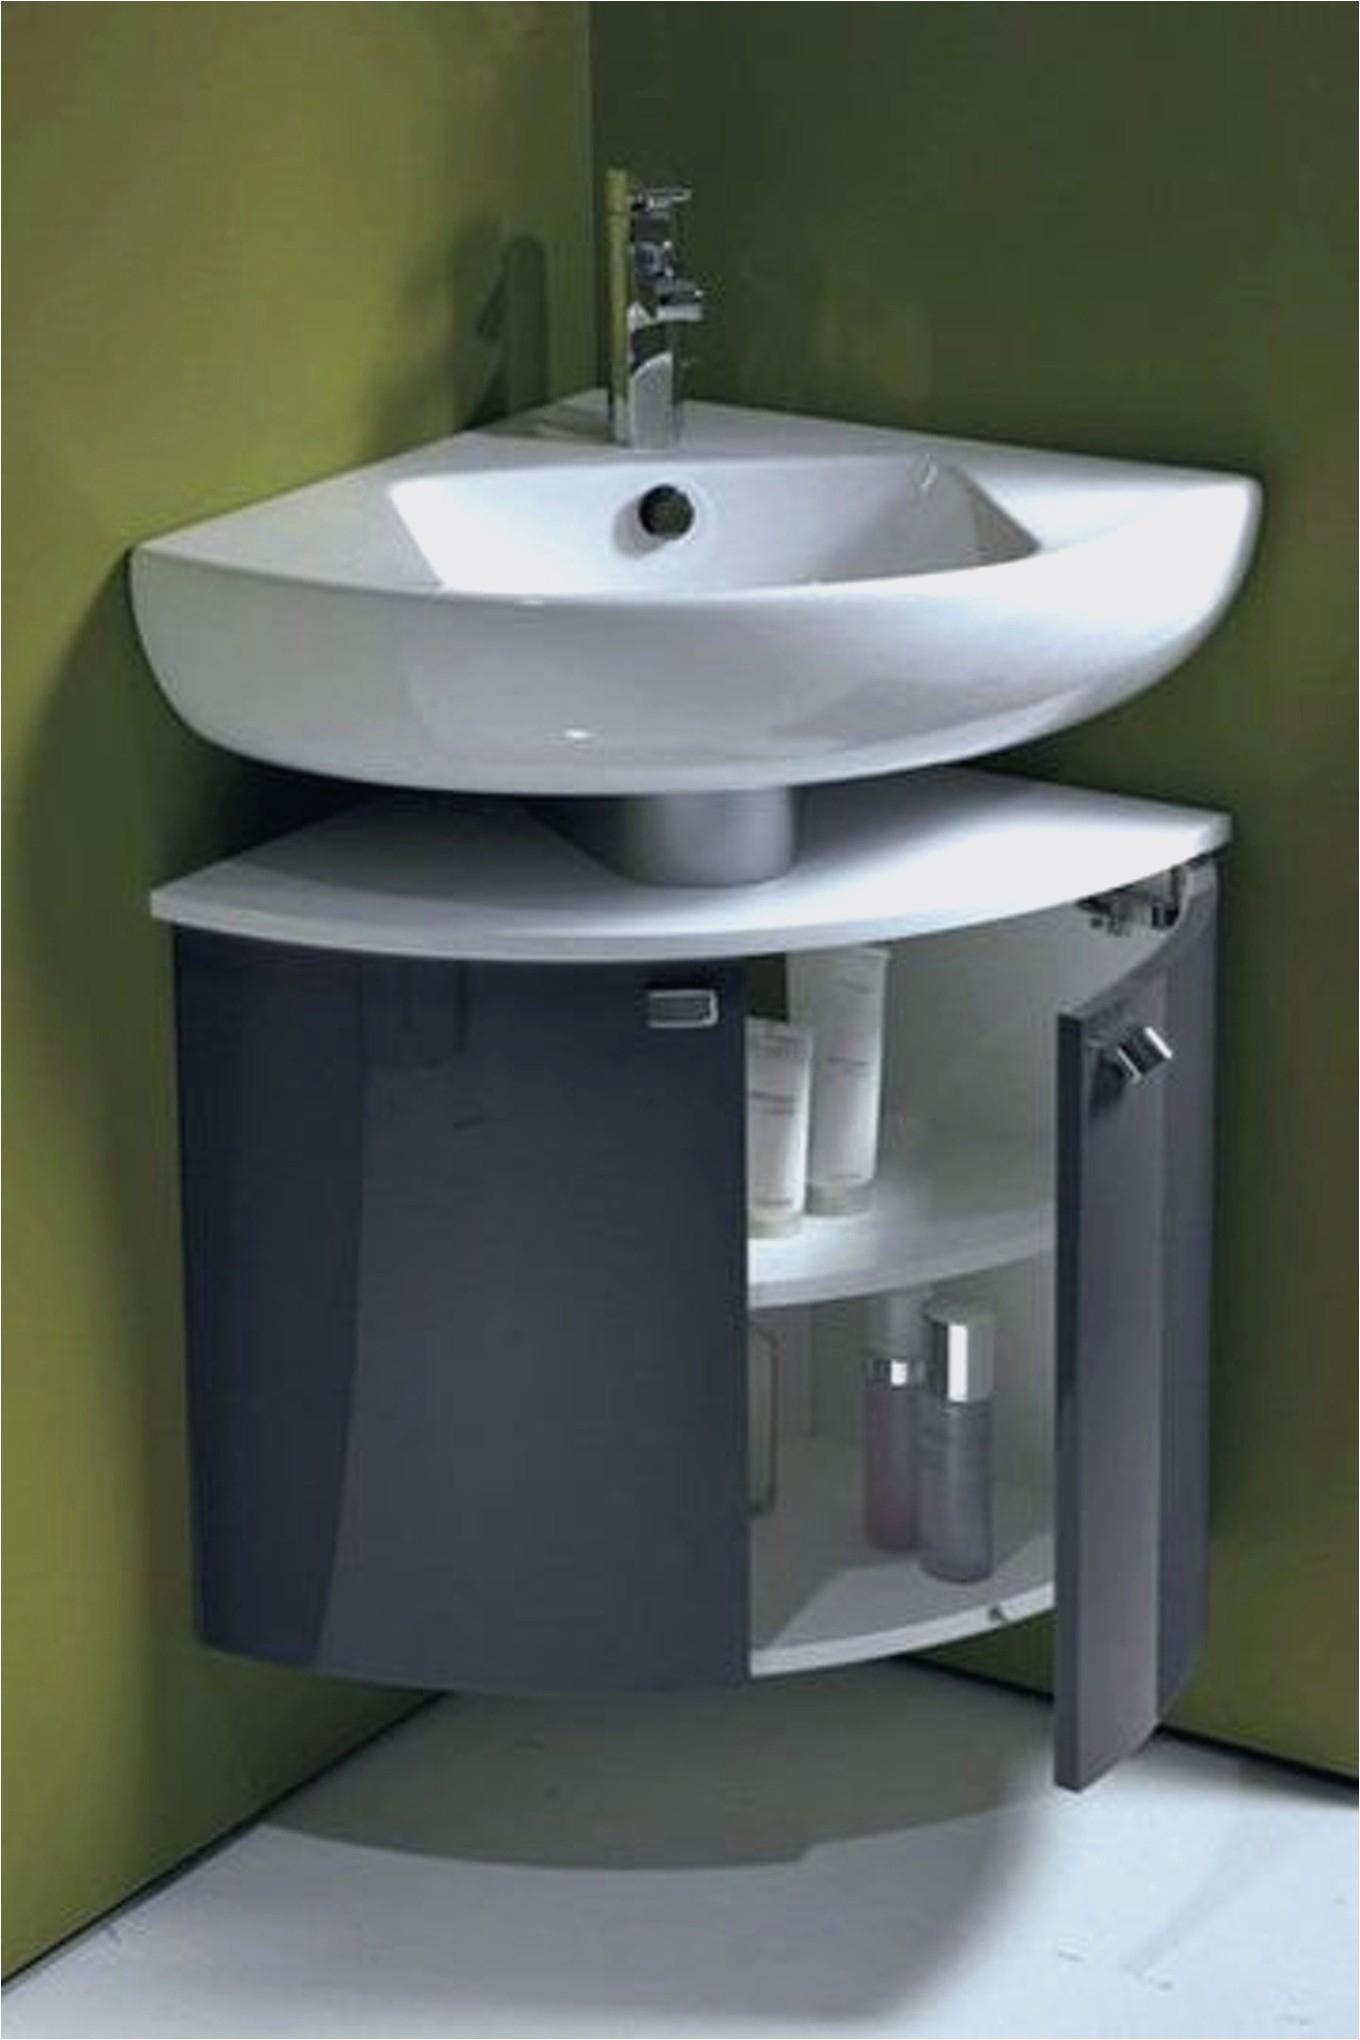 Ikea Meuble Double Vasque Inspirant Photos Meuble Lavabo D Angle Salle De Bain Lave Main Ikea Frais Meuble